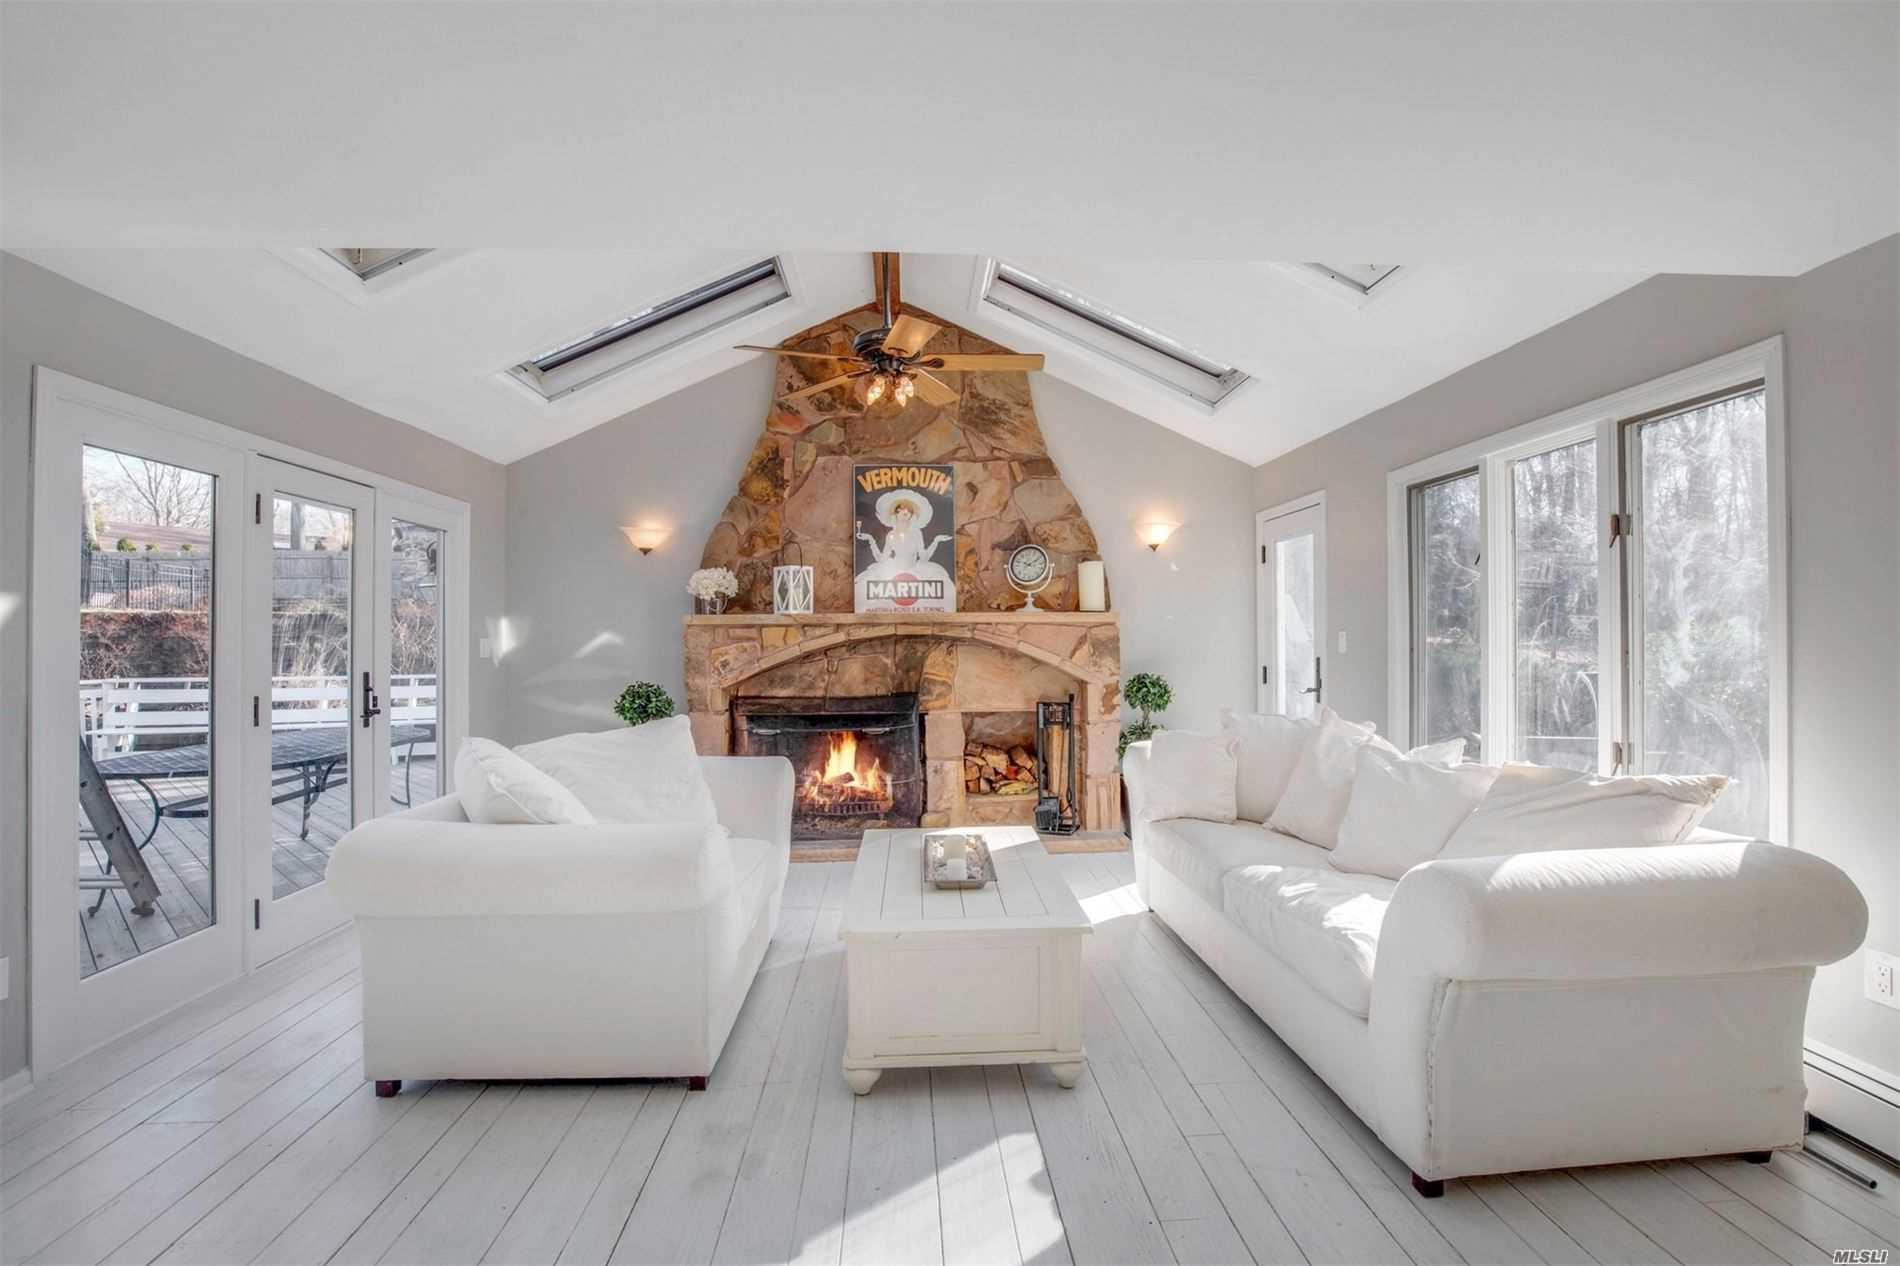 10 Gorham Ln - Dix Hills, New York